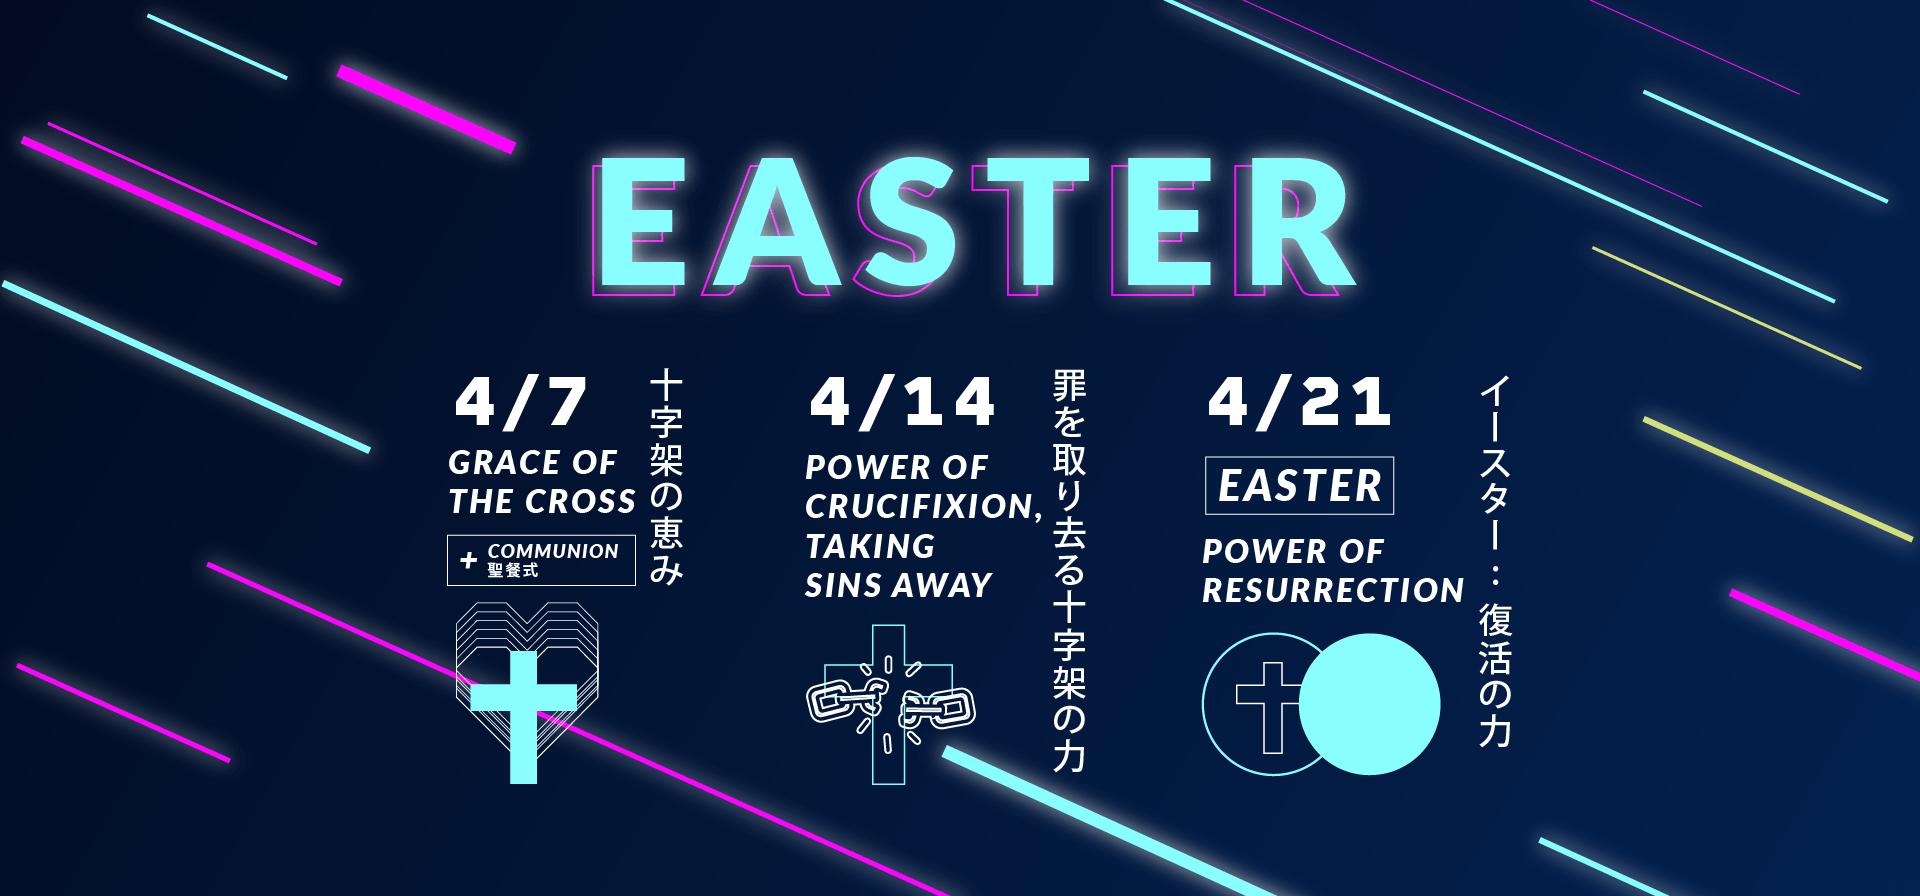 International Church Easter Service